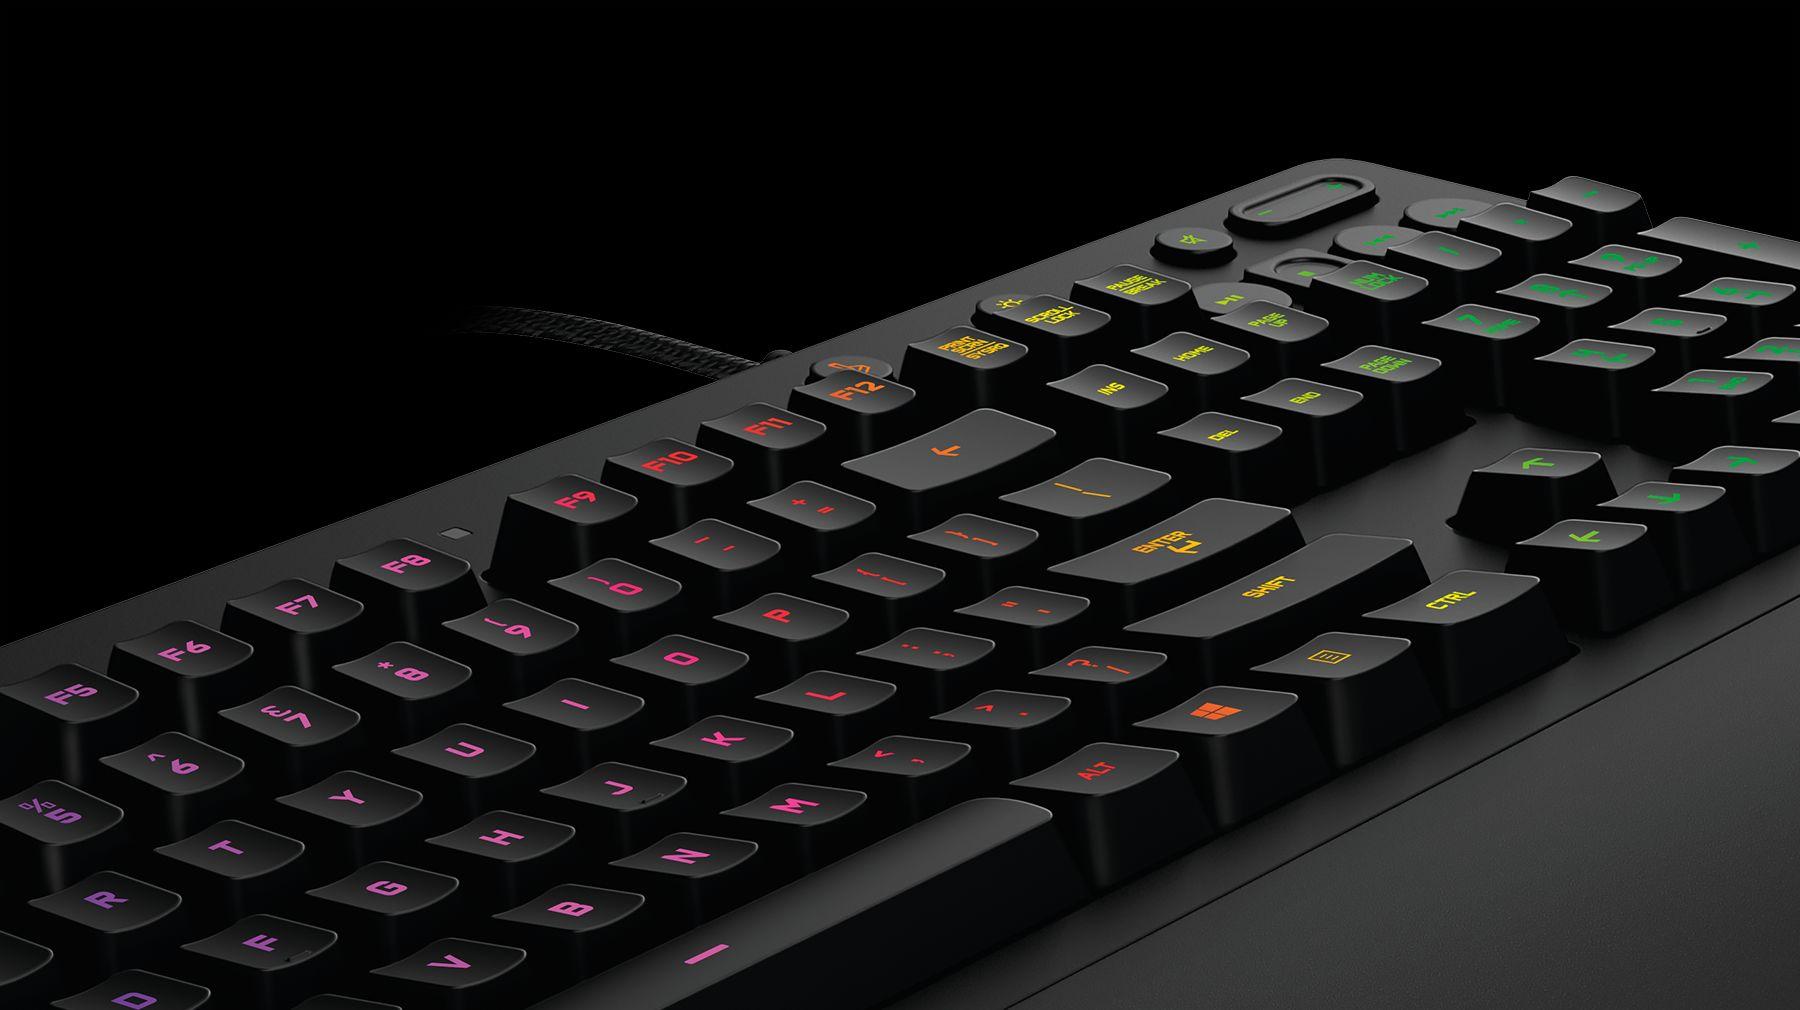 G213PRODIGYRGBキーボード 斜め上